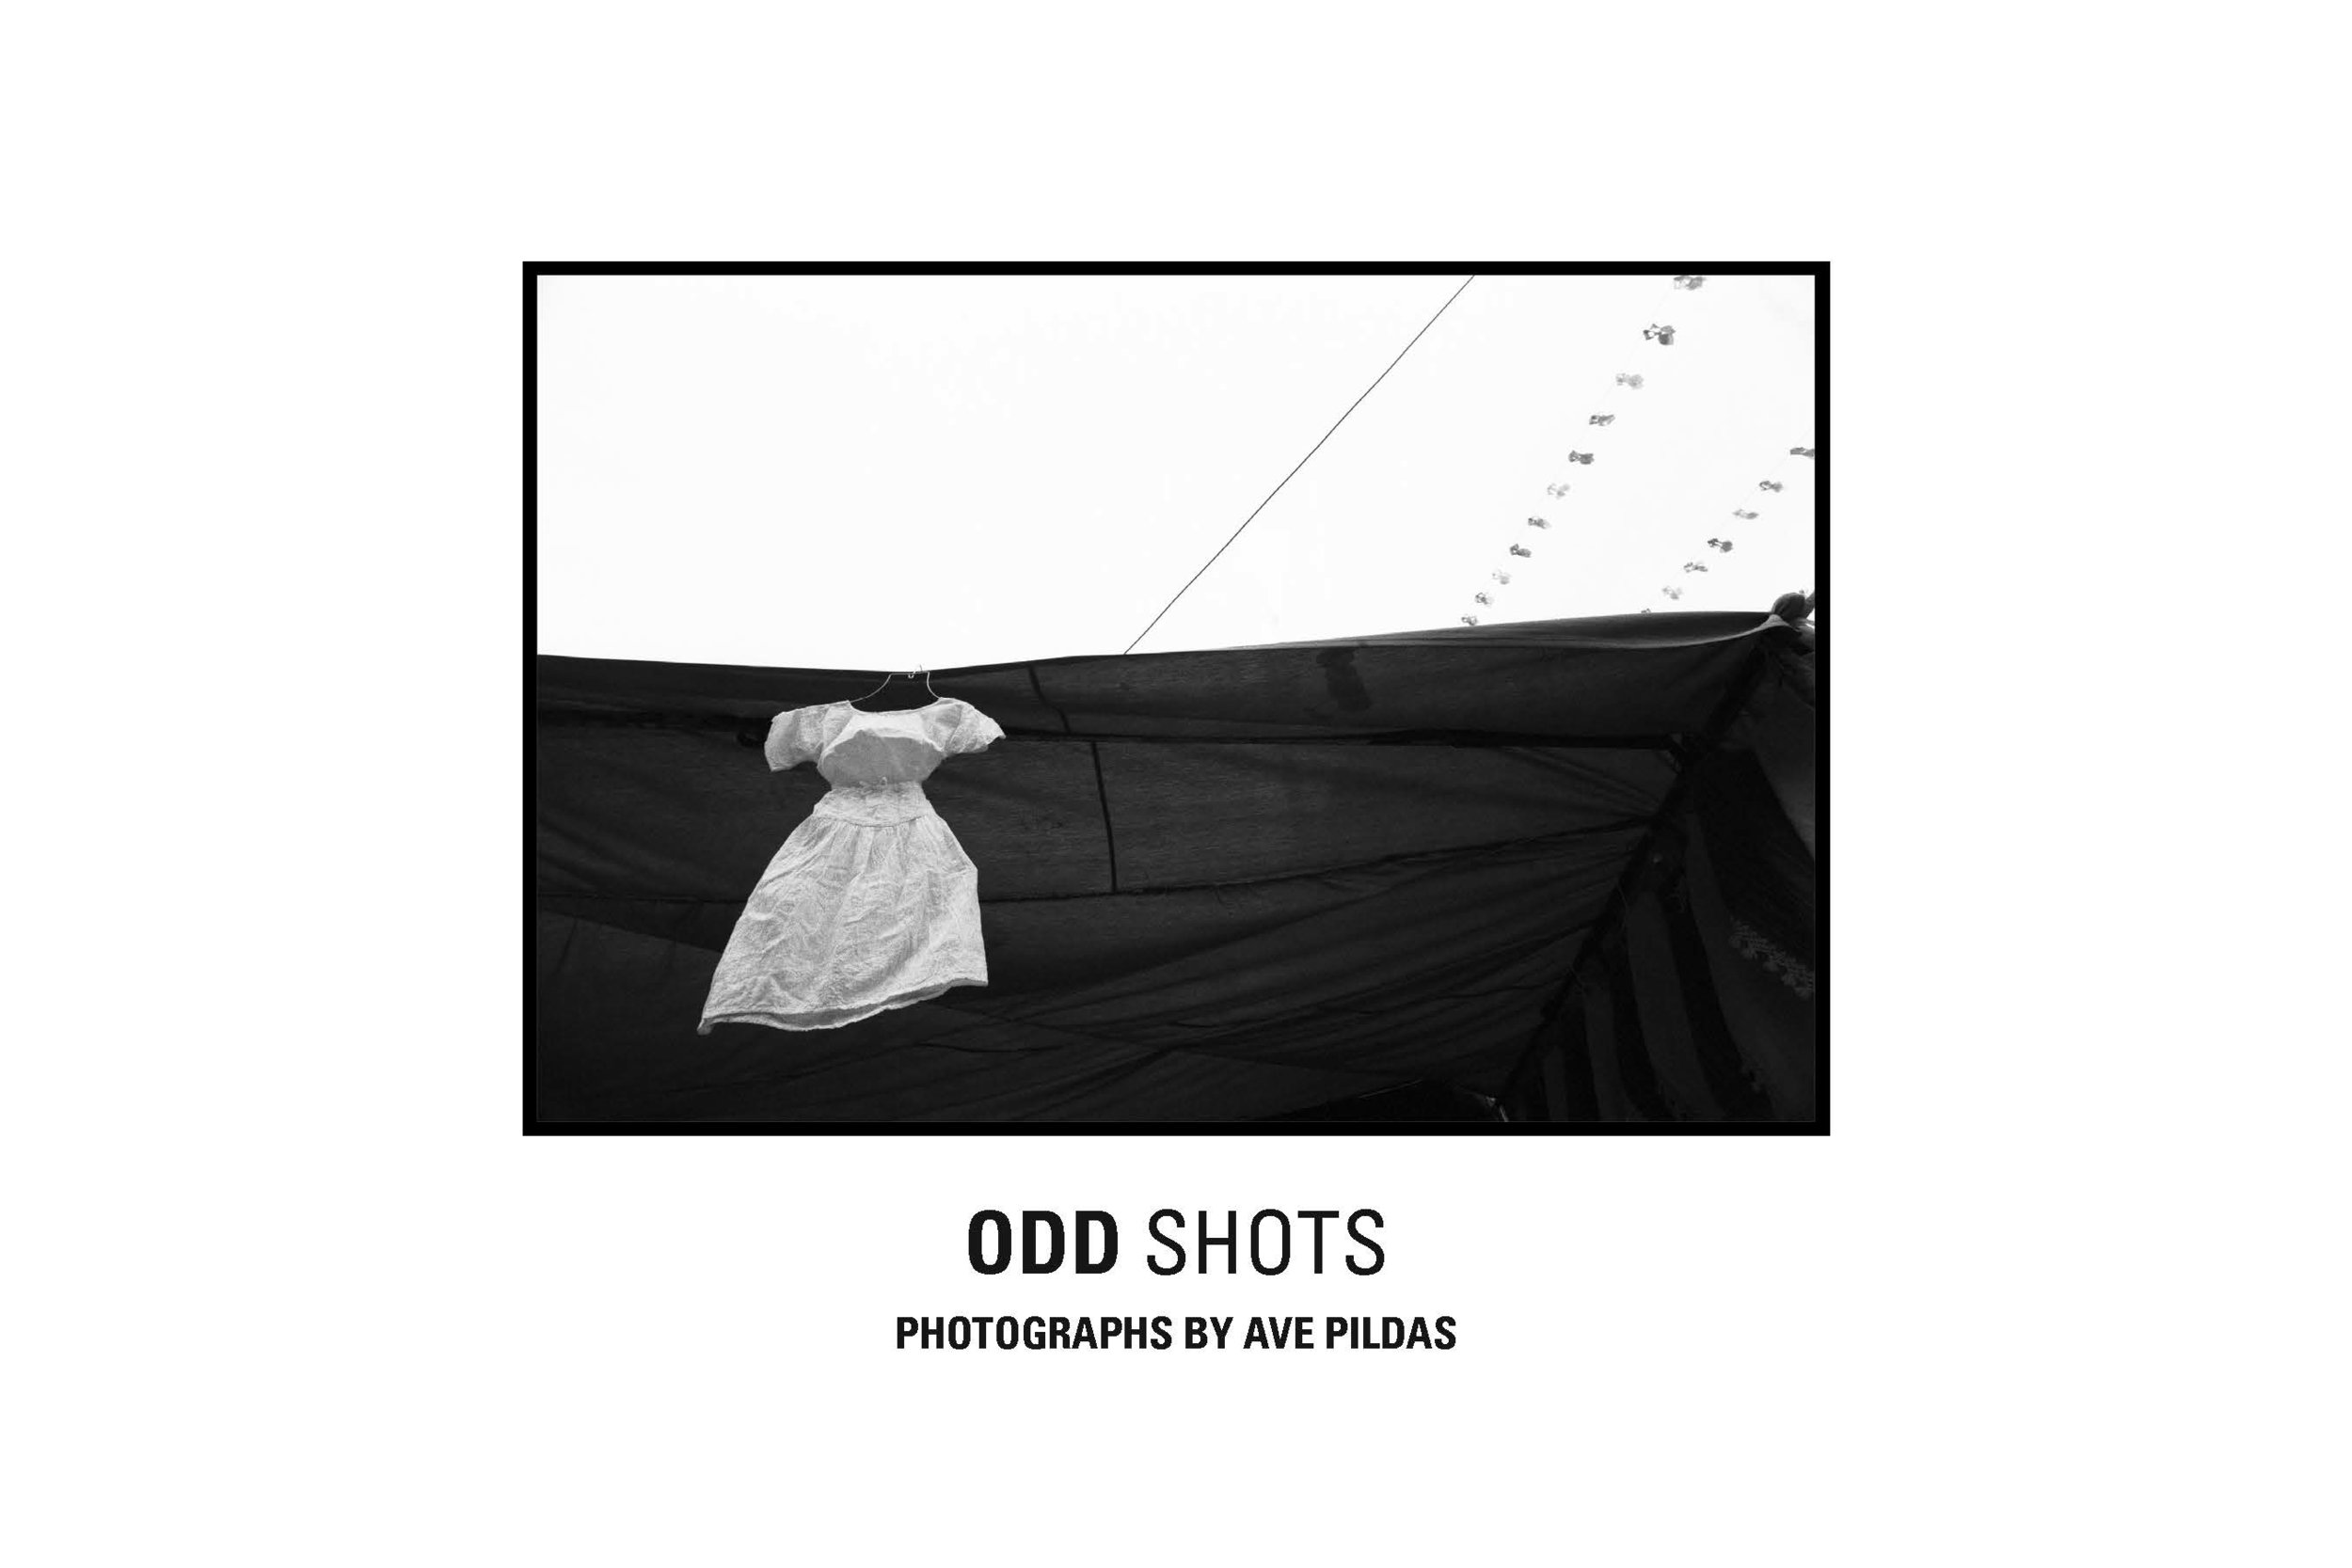 Odd Shots by Ave Pildas